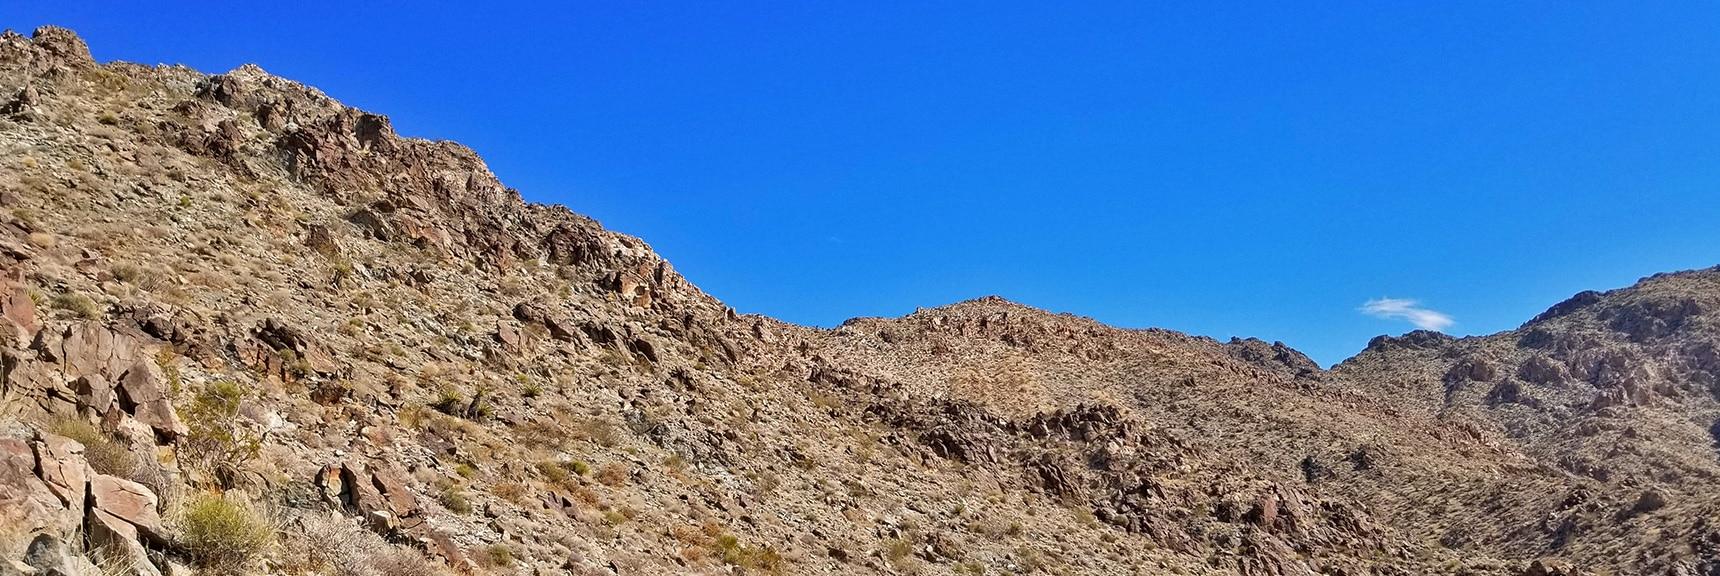 Ridge System Leading Further Upward Toward Mt. Wilson | Mt Wilson, Black Mountains, Arizona, Lake Mead National Recreation Area